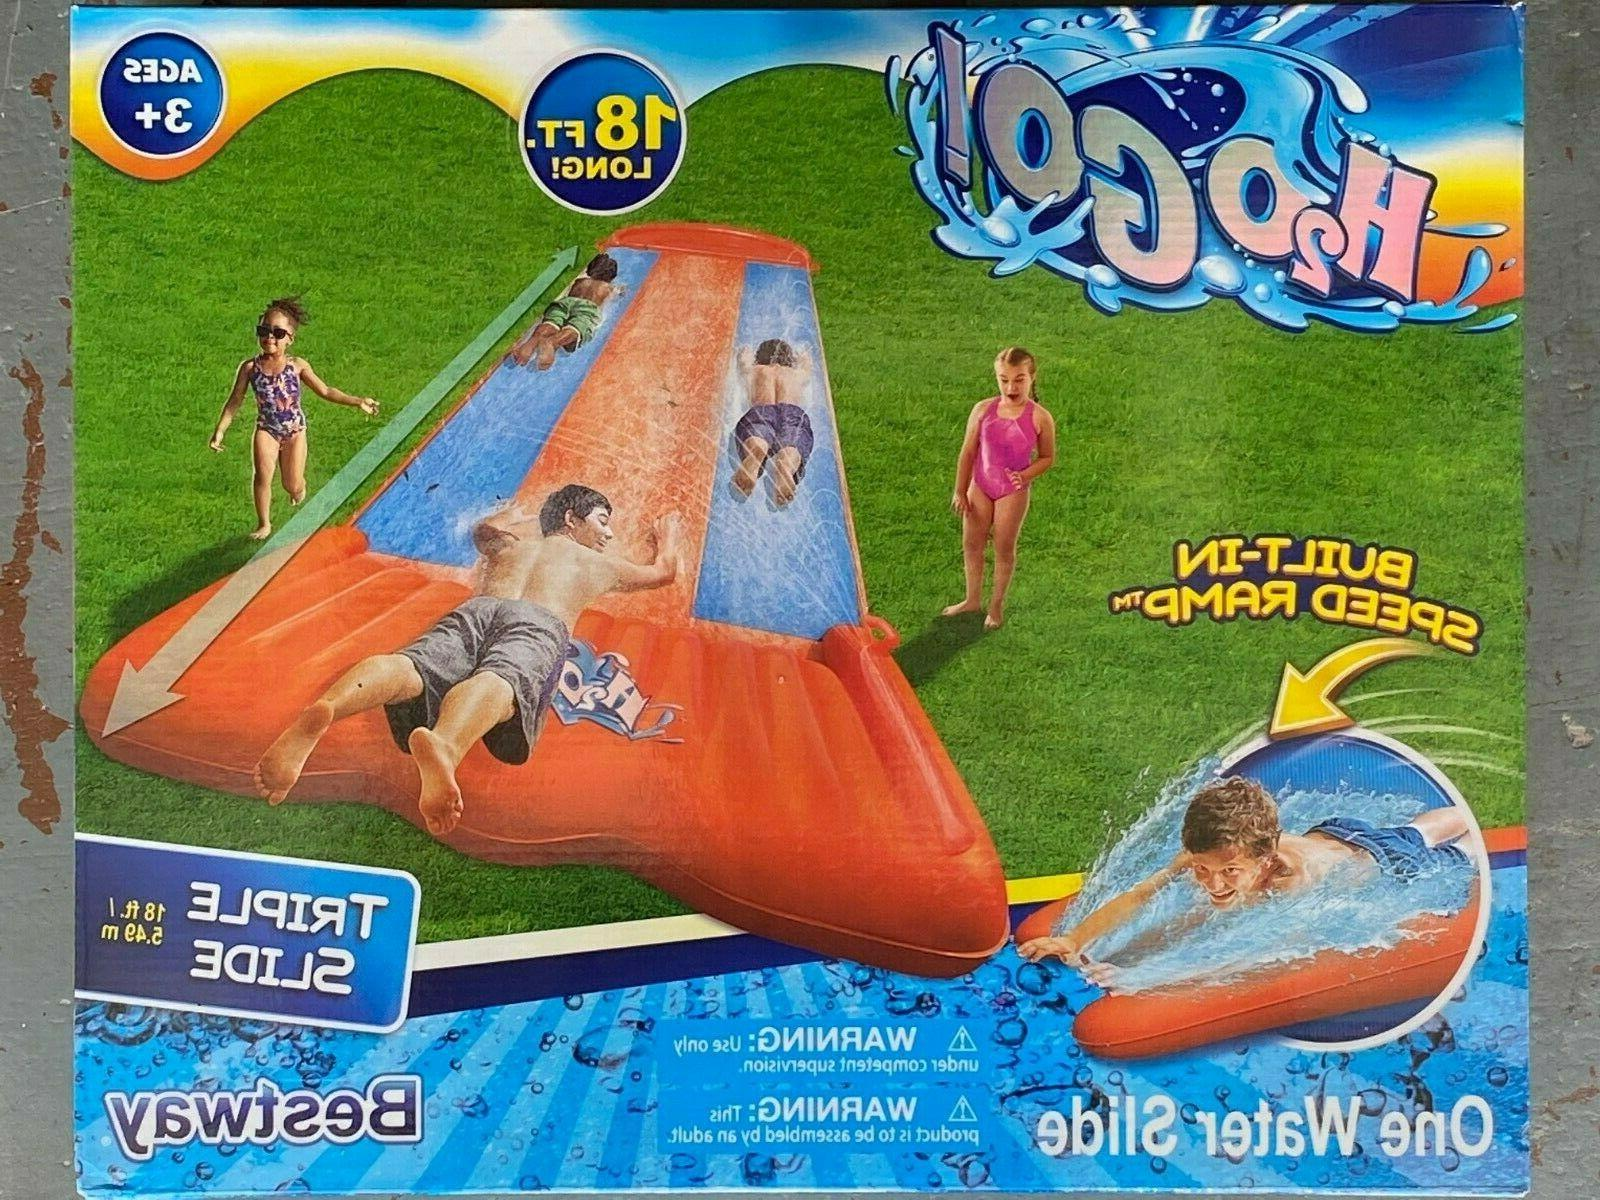 NEW H20 Slip N Ramp Drench Pool Feet